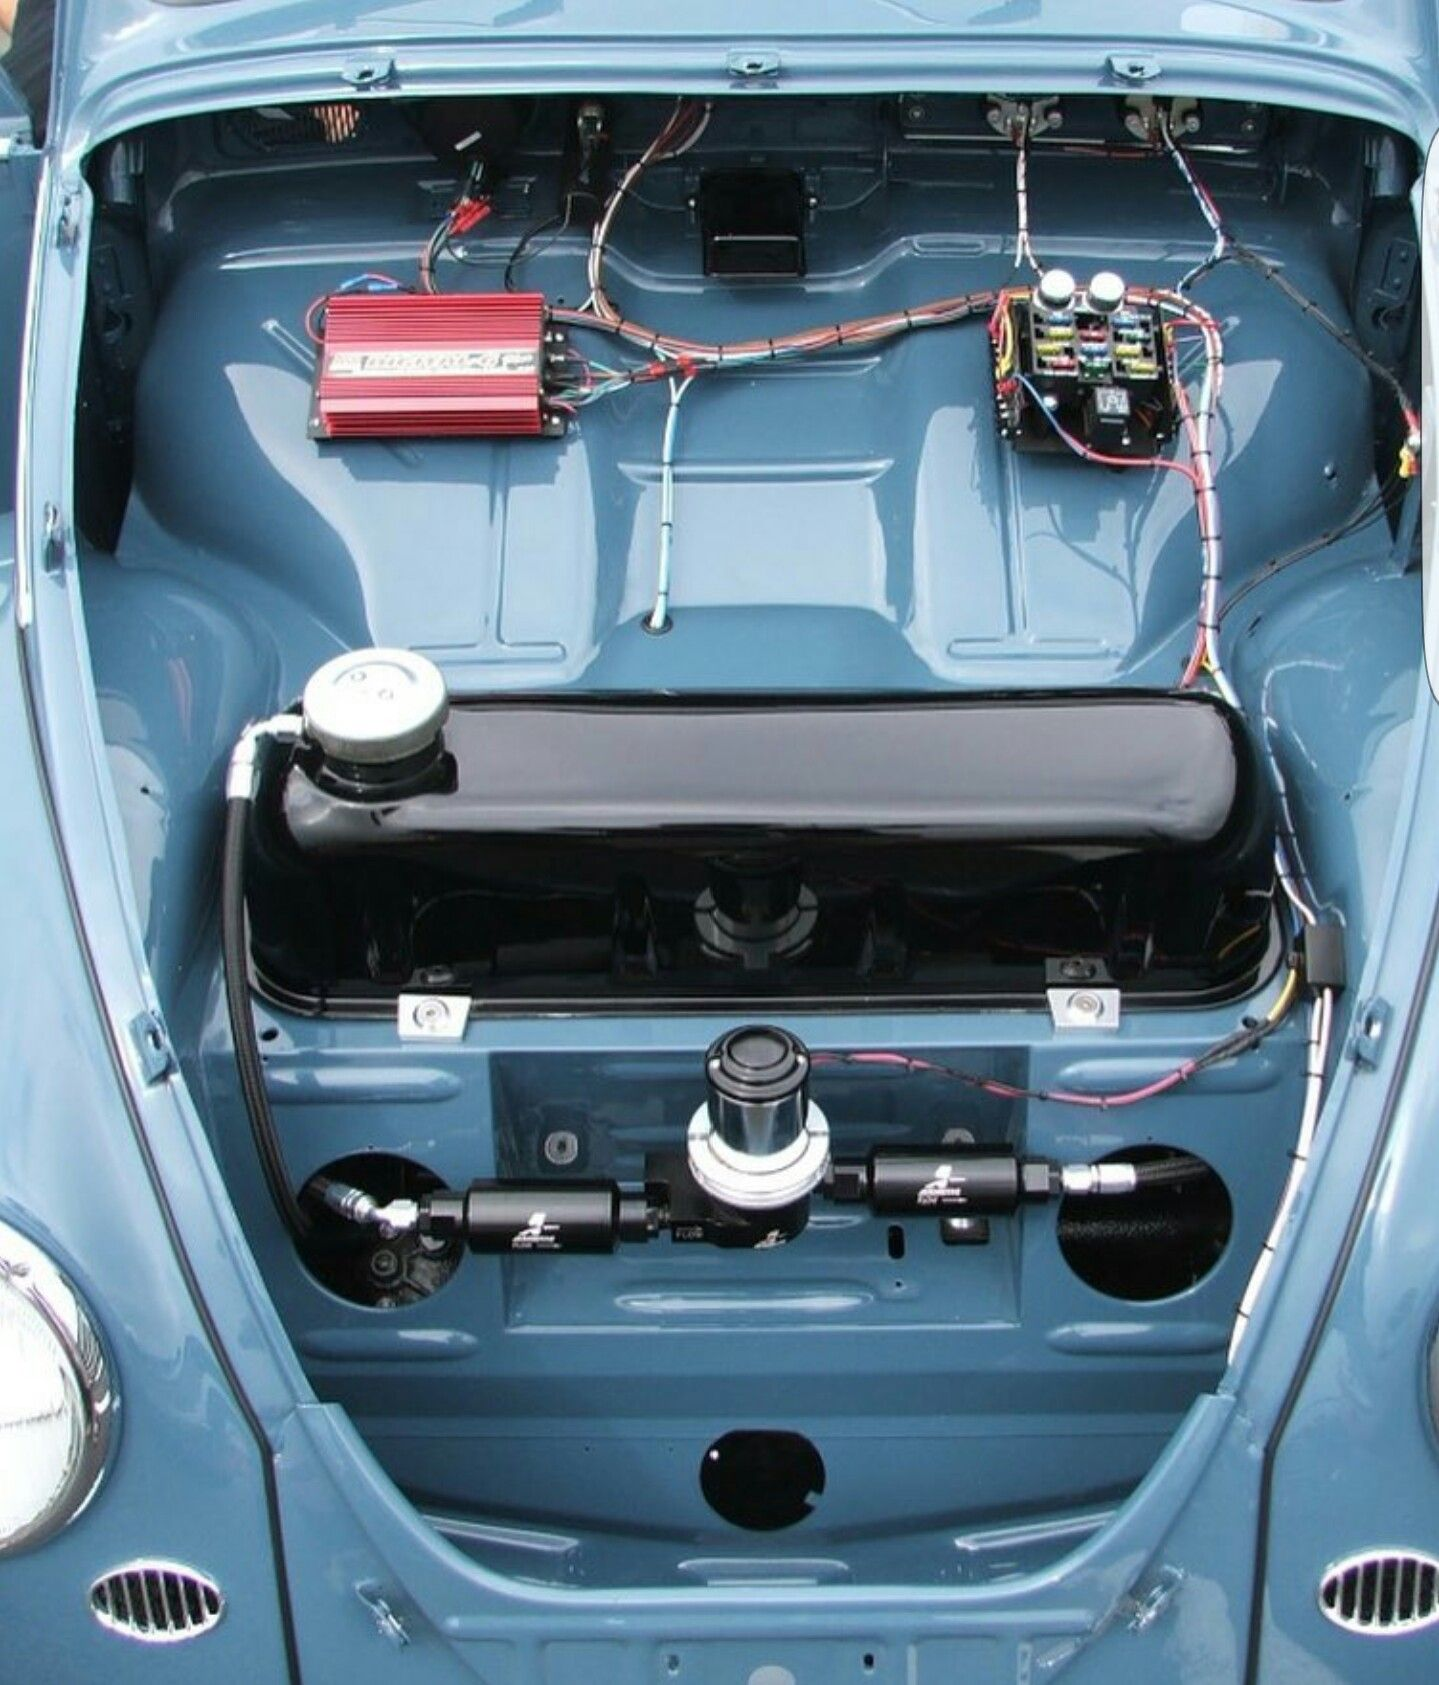 Porsche 911 Engine Vw Beetle: Pin By Micheal Erasmus On Beetles